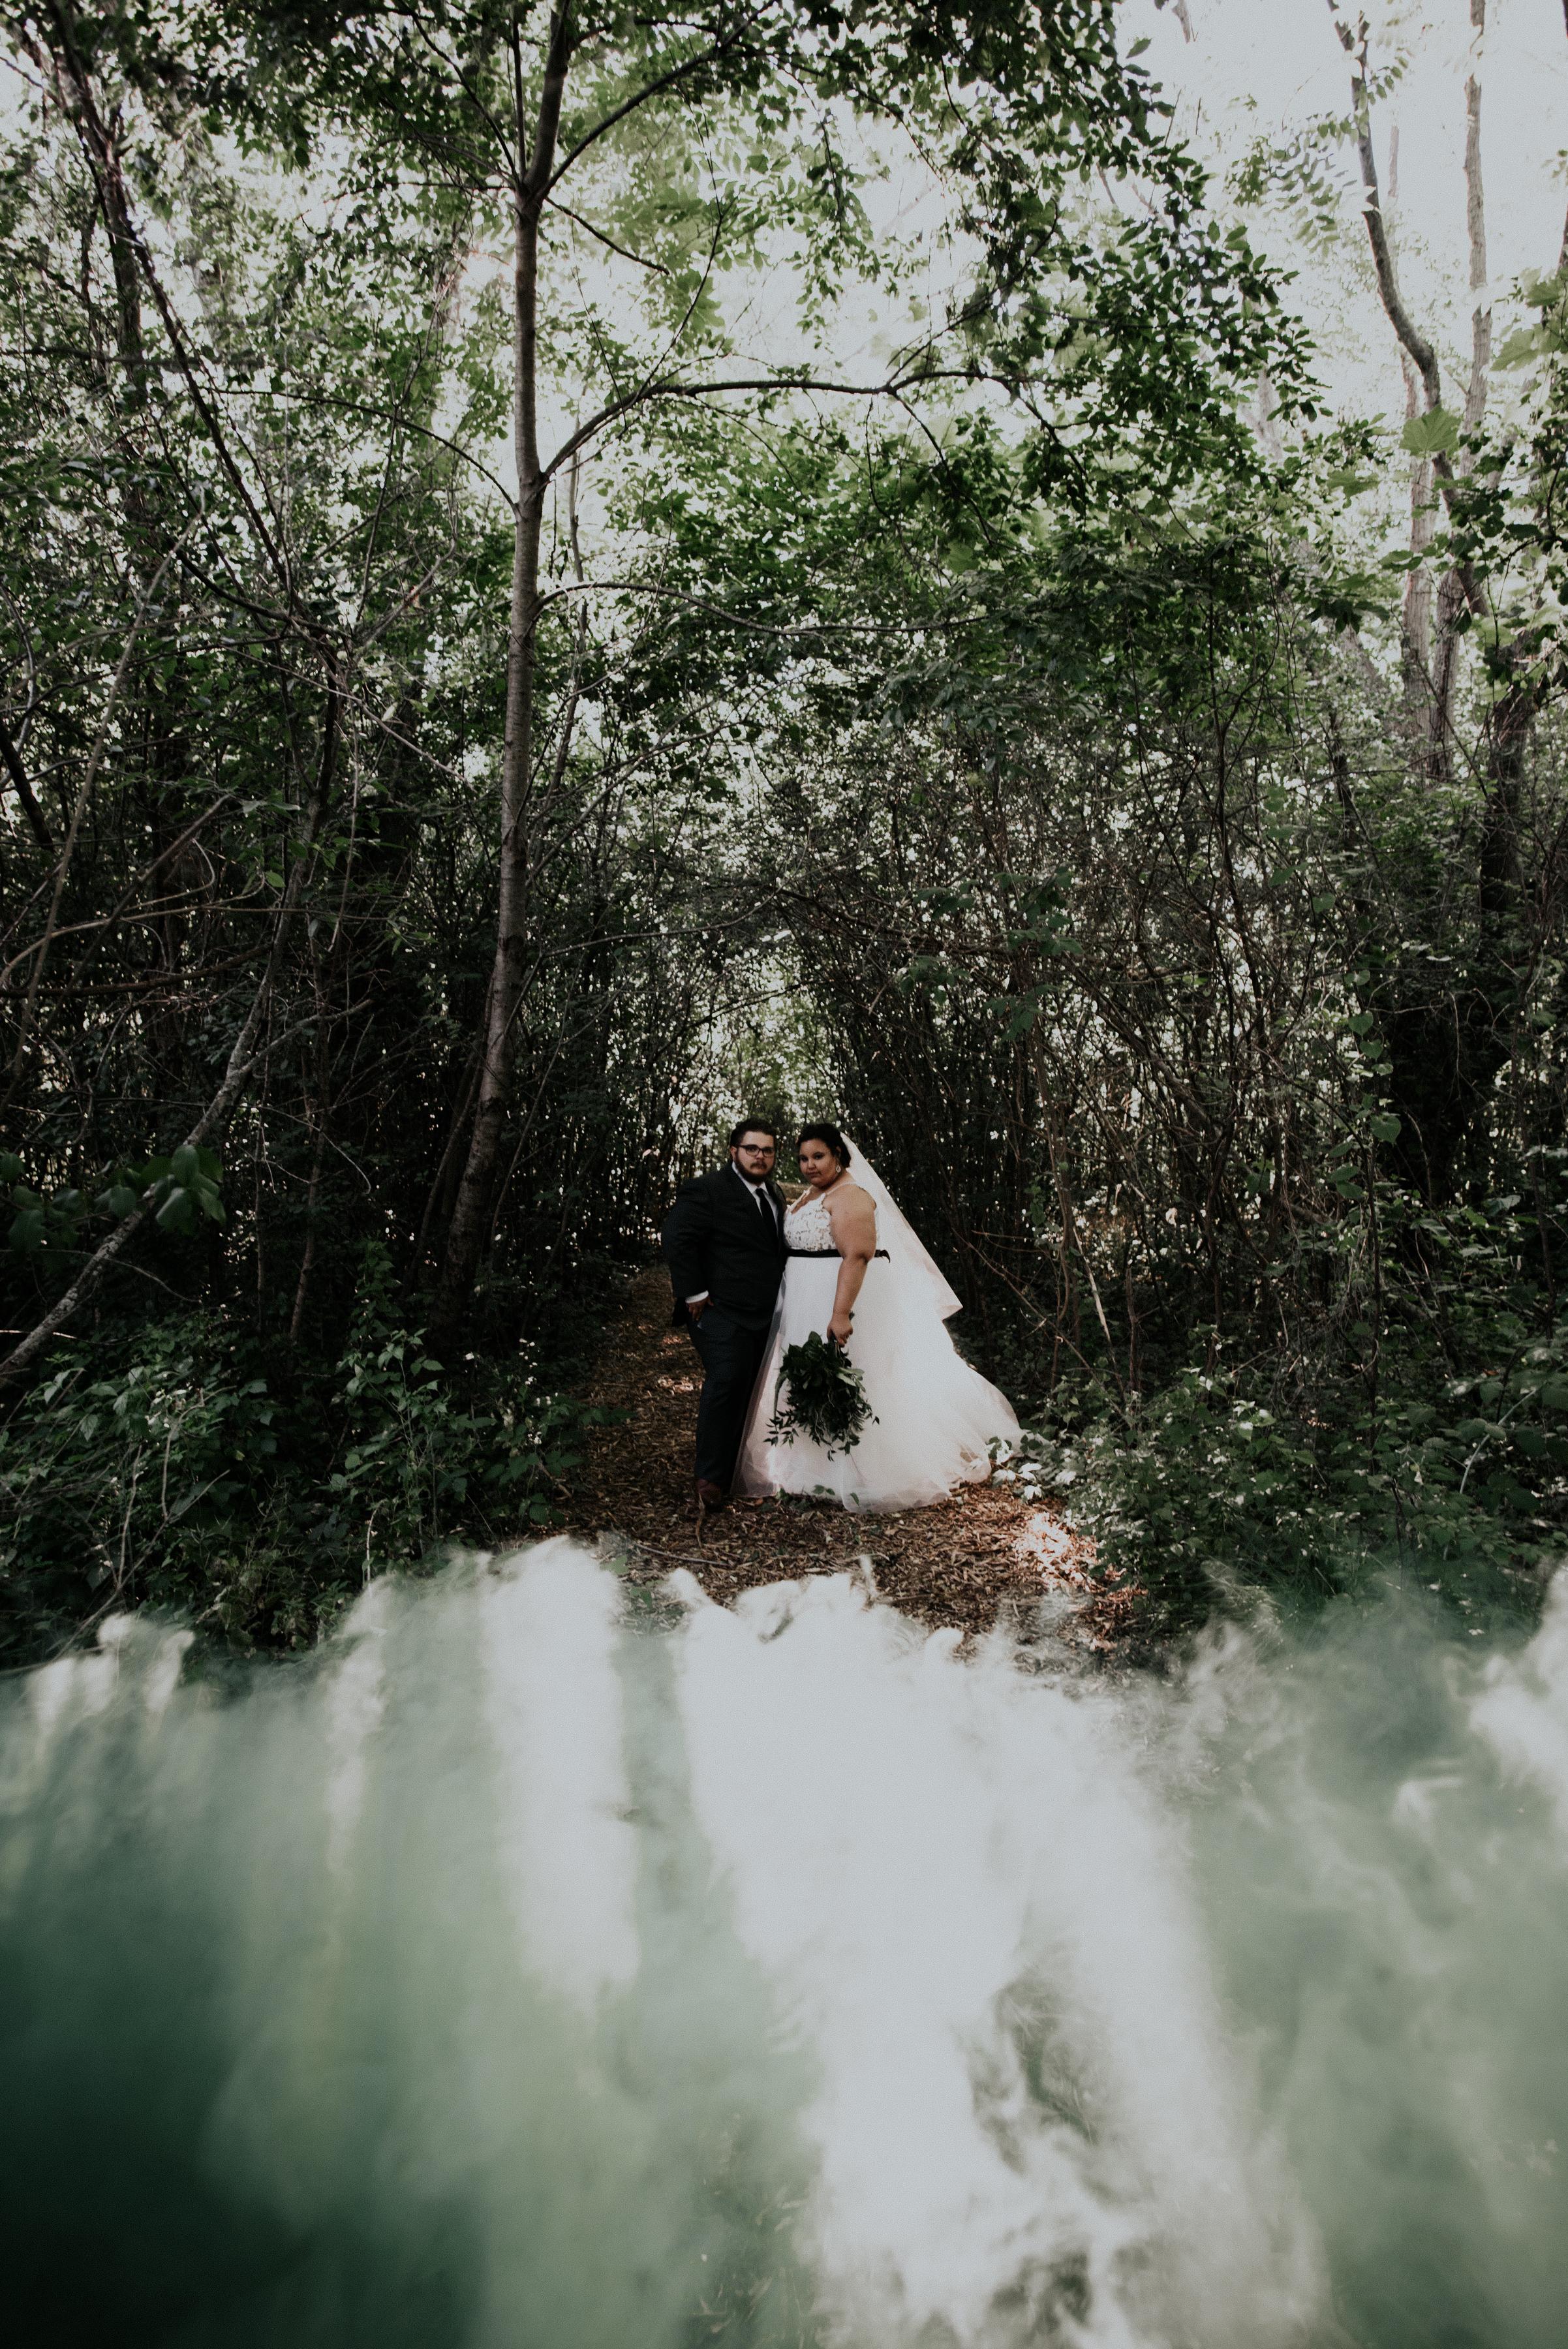 BridesbyYoung-RealWedding-PlusSizeBridal-BillyCourtney-JurassicParkTheme-40.jpg